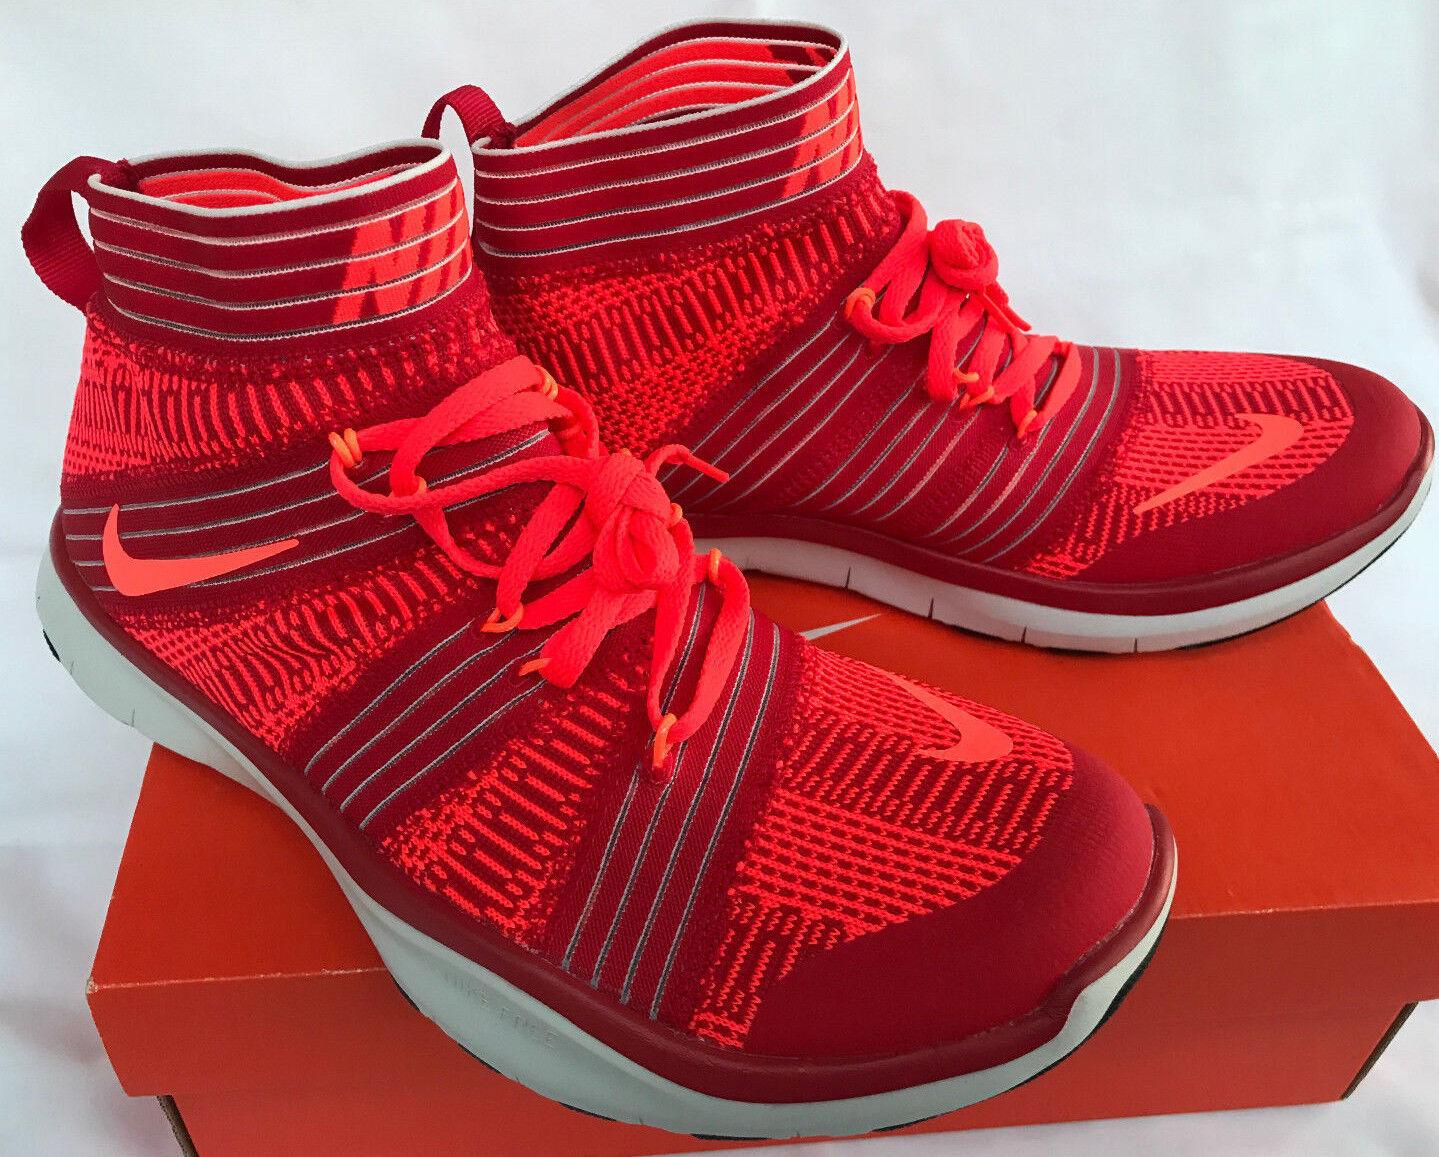 new Nike Free Train Virtue 898052-600 Red 5K Shoes Marathon Running Shoes 5K Men's 10.5 b1113b